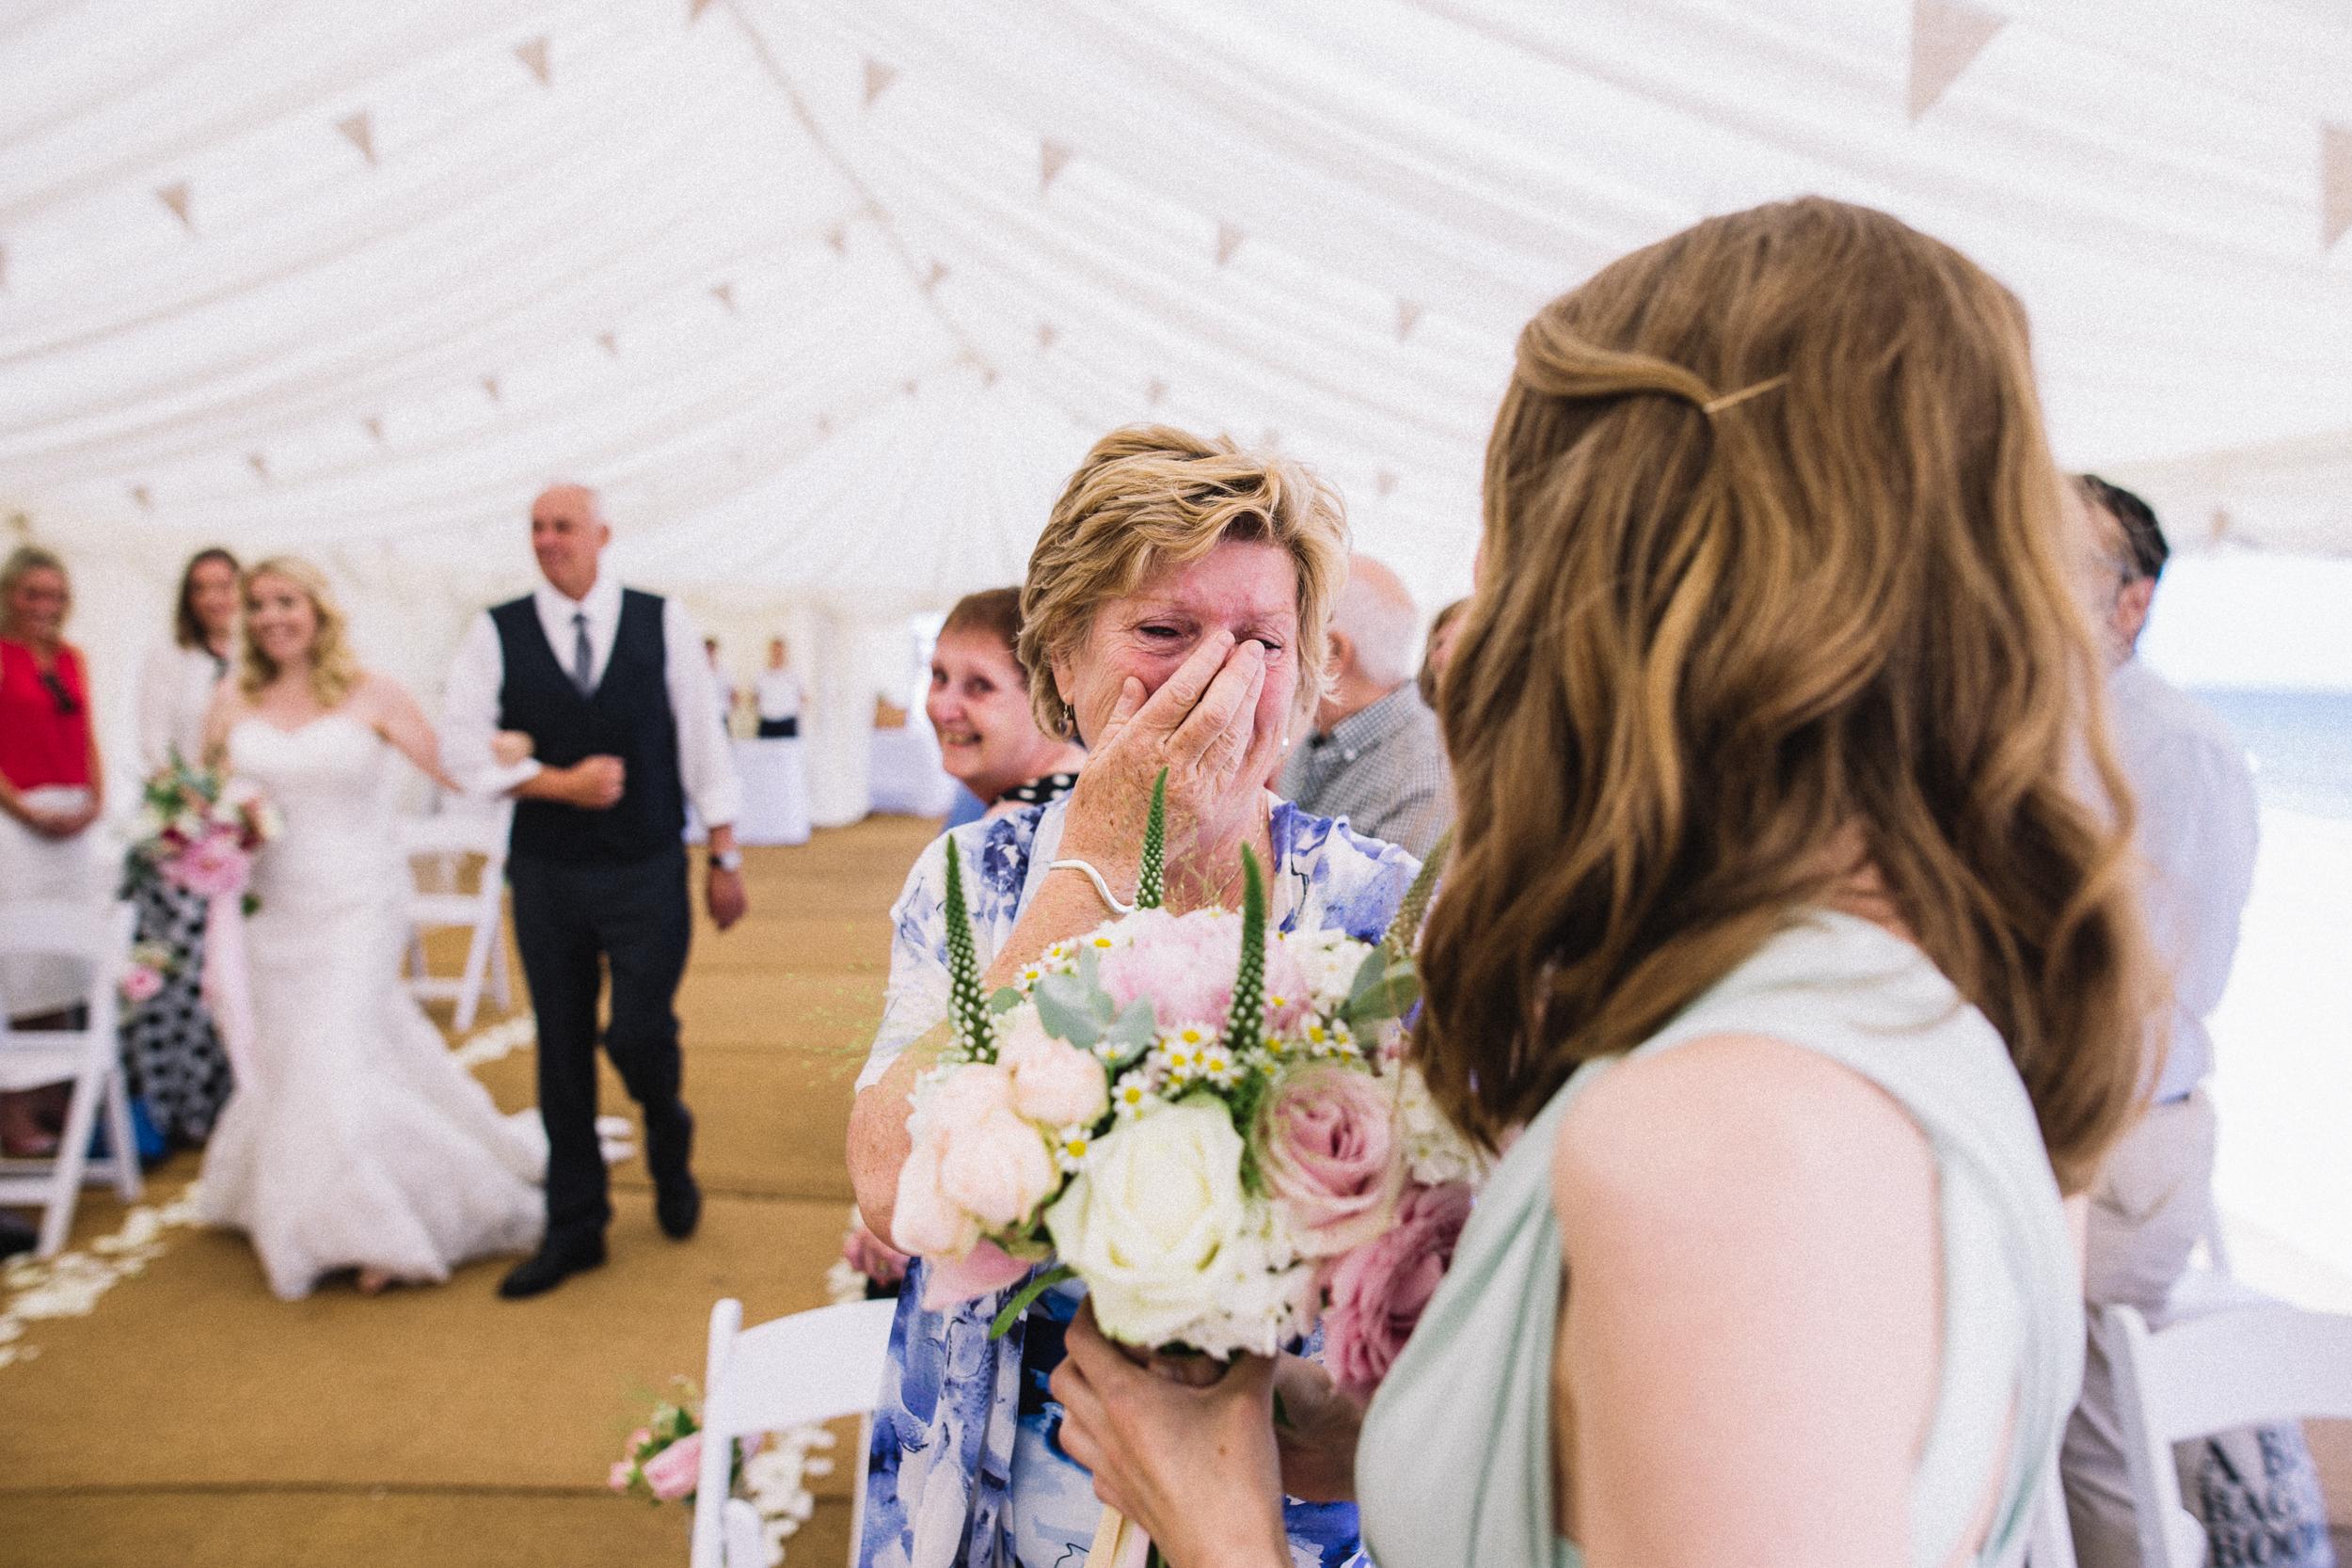 creative-wedding-photography-teesside-north-east-yorkshire-36.jpg